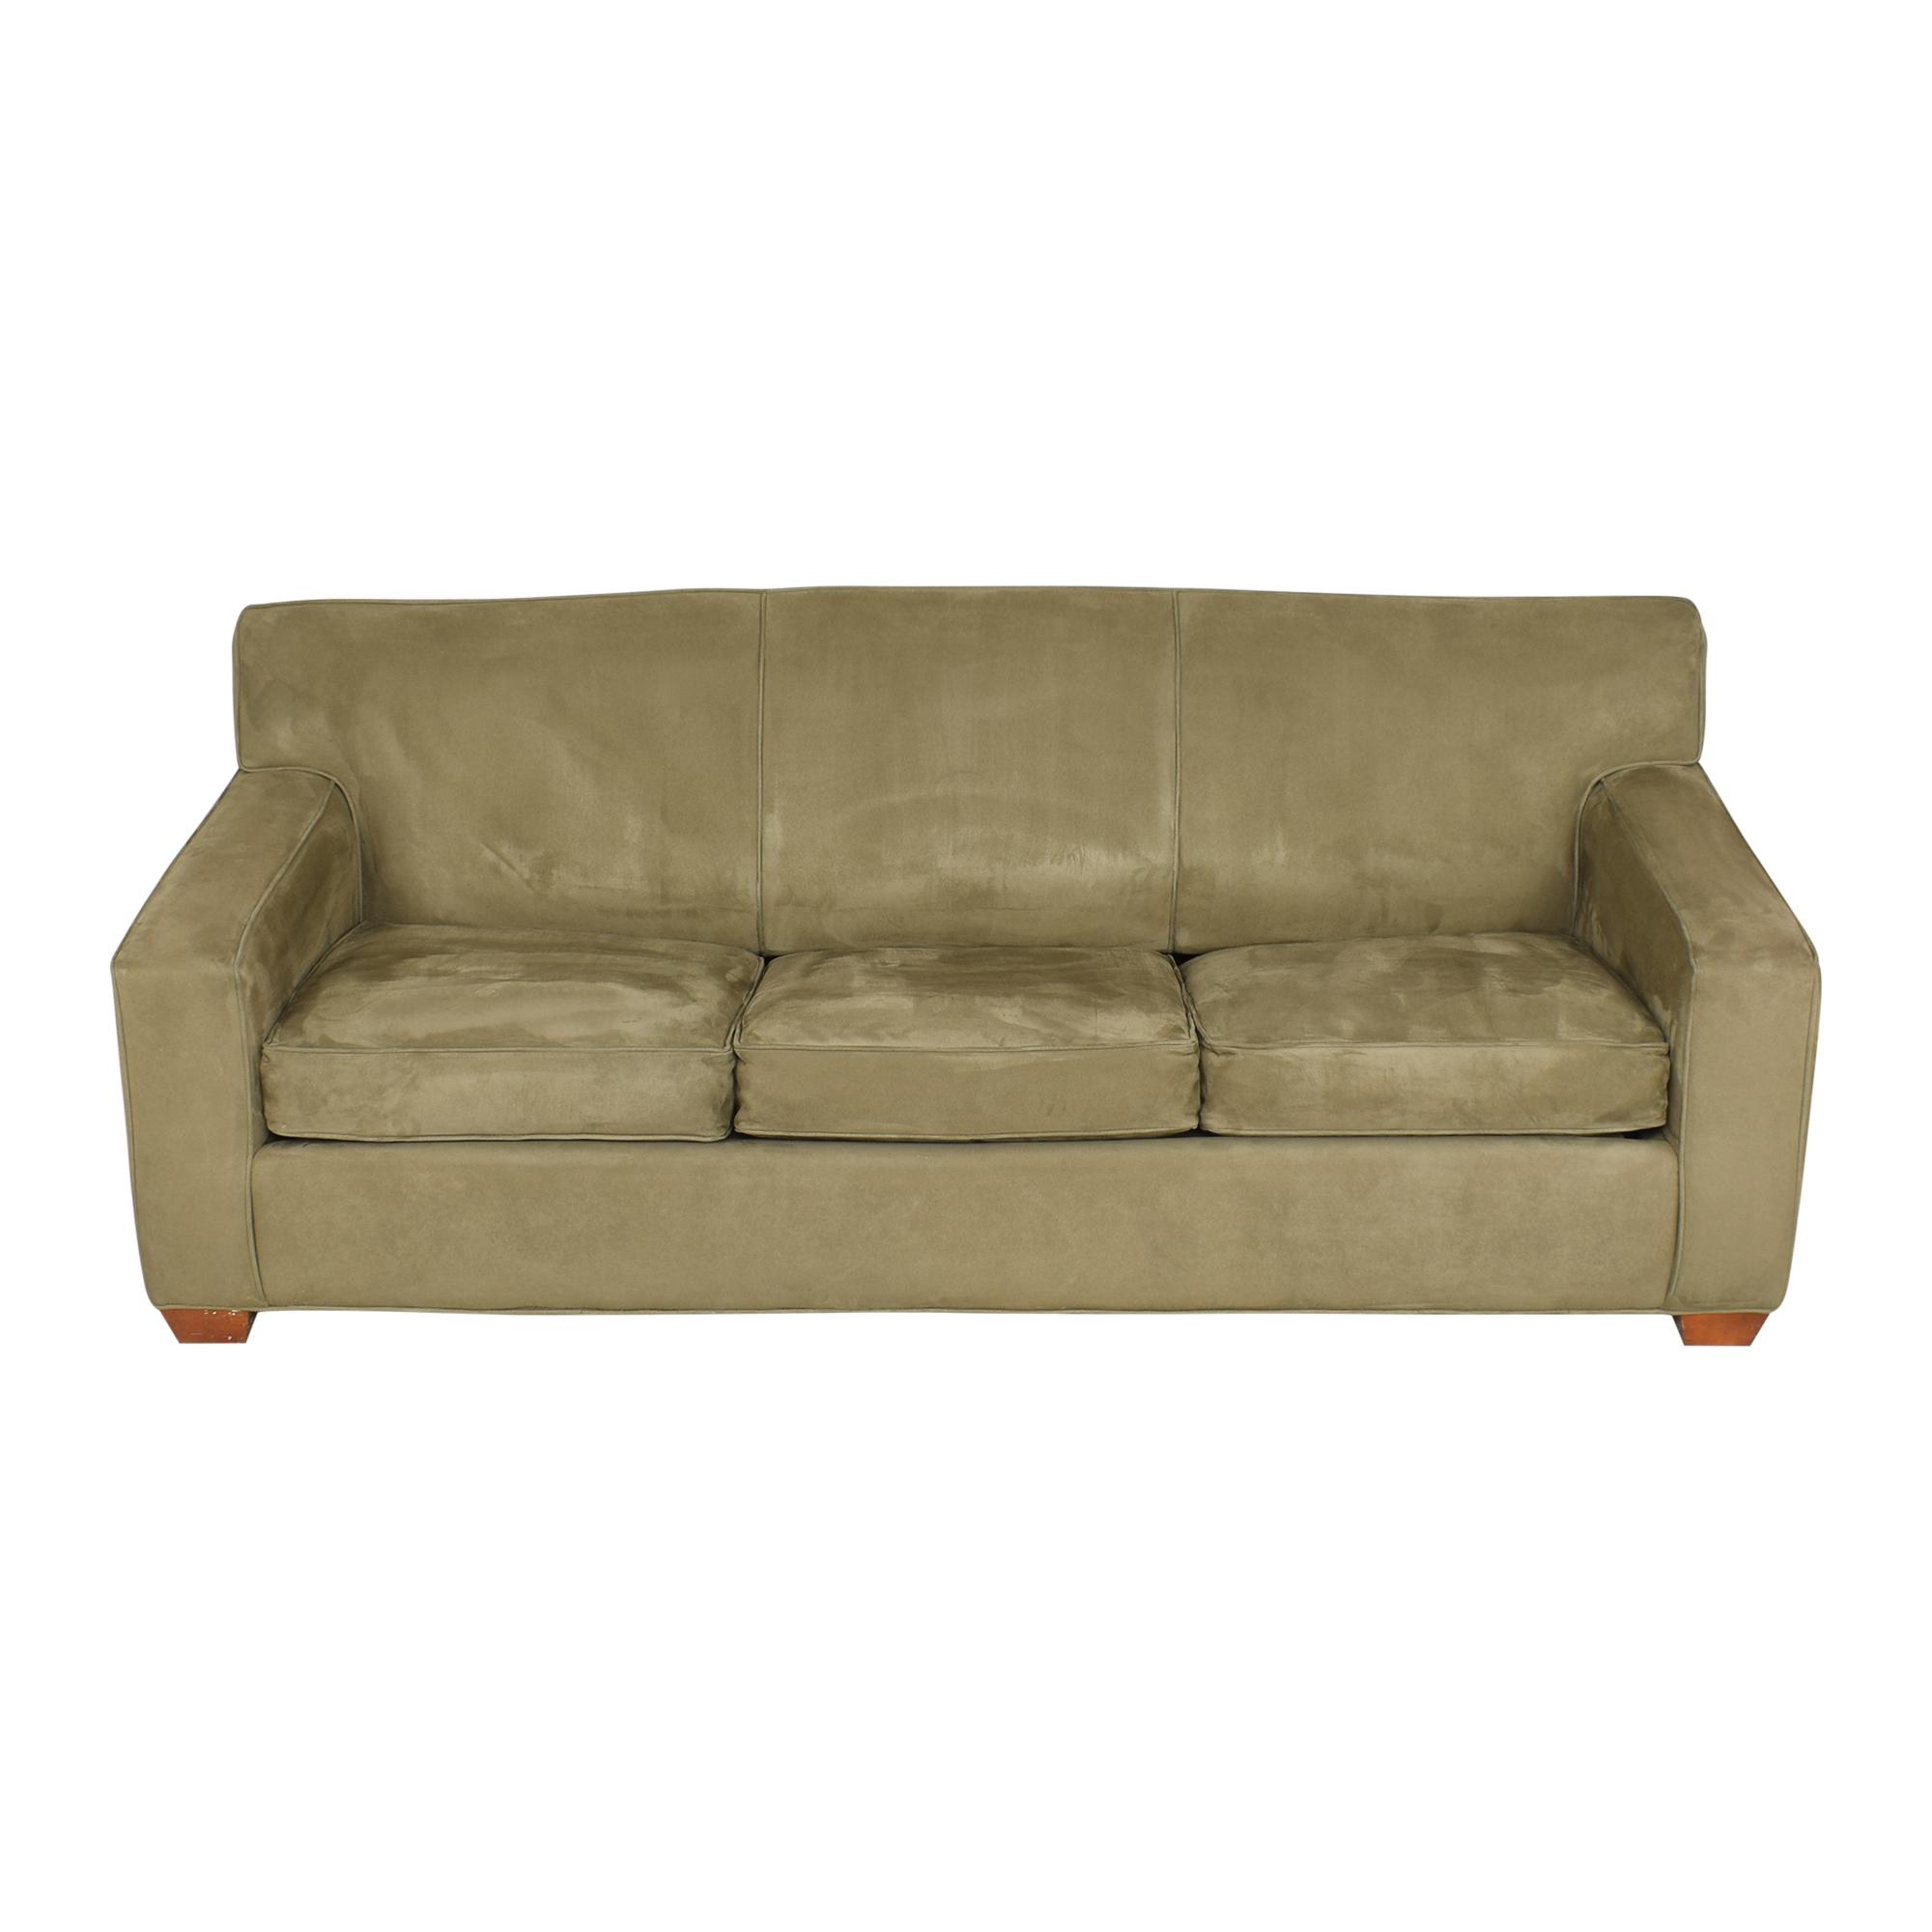 Crate & Barrel Crate & Barrel Three Cushion Sleeper Sofa  discount